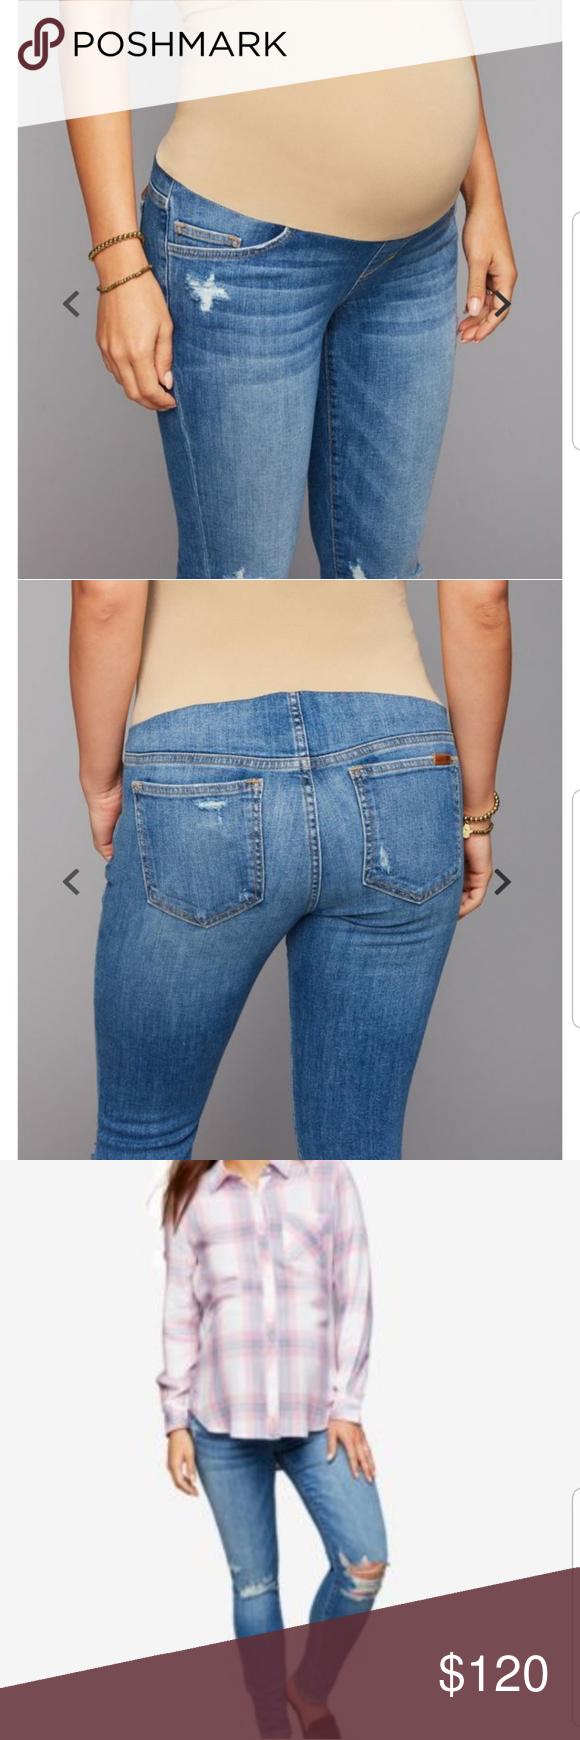 4a66769f9891c Joe's Jeans Maternity Skinny Jeans Joe's Secret Fit Belly Icon Skinny Ankle  Maternity Jeans Midge Medium